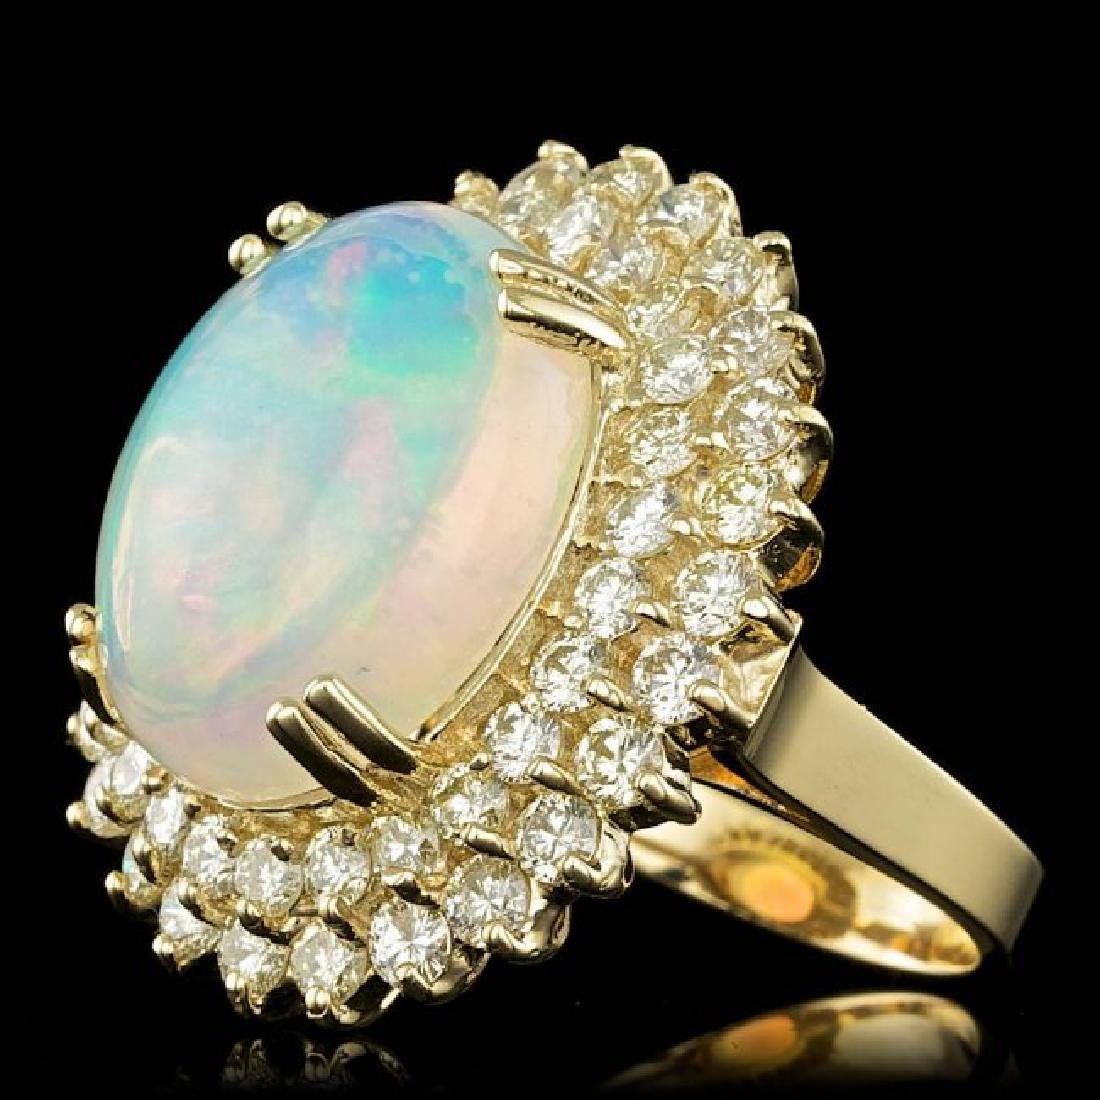 14k Yellow Gold 9.00ct Opal 3.15ct Diamond Ring - 2